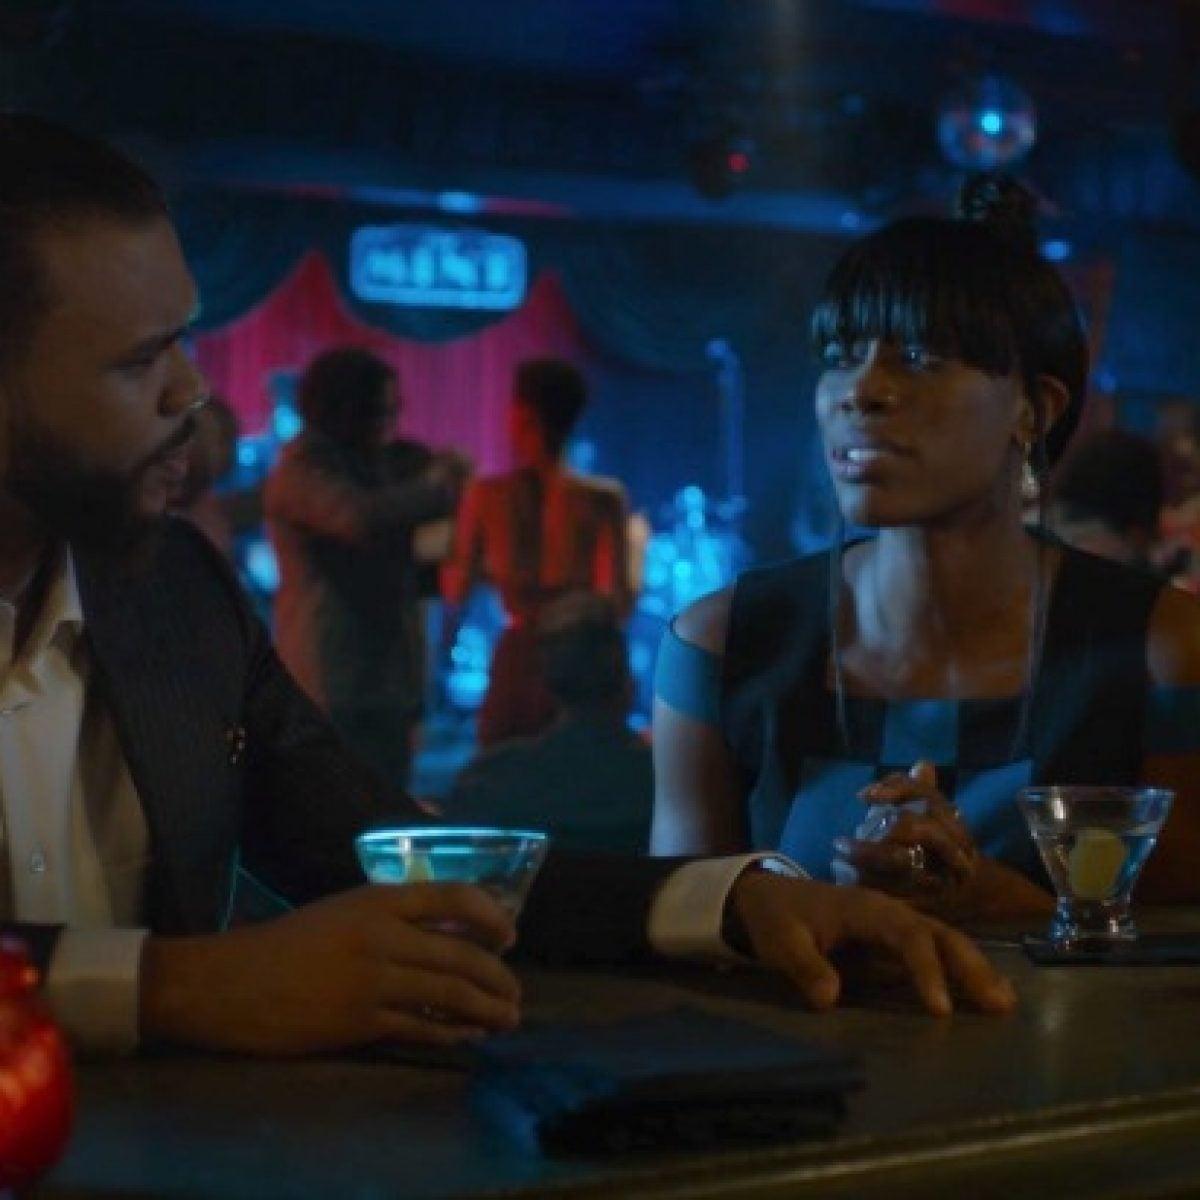 'Insecure' Guest Star Jidenna Is Hella Like Yvonne Orji's New On-Screen Love Interest Andrew